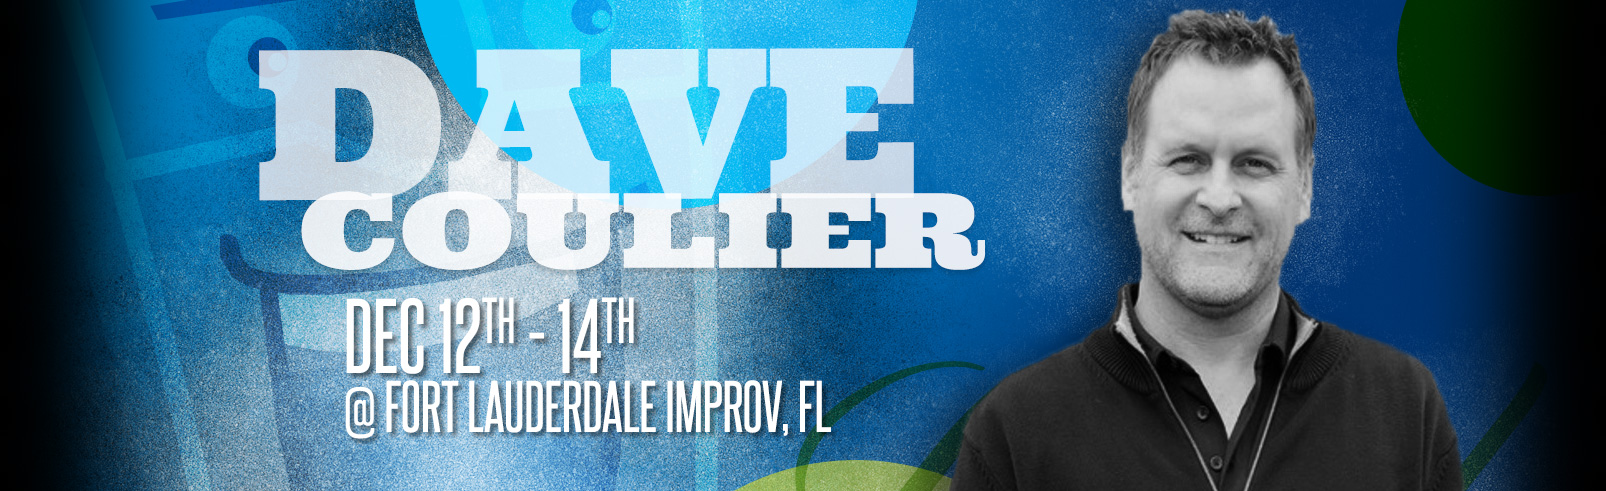 Dave Coulier @ Fort Lauderdale Improv